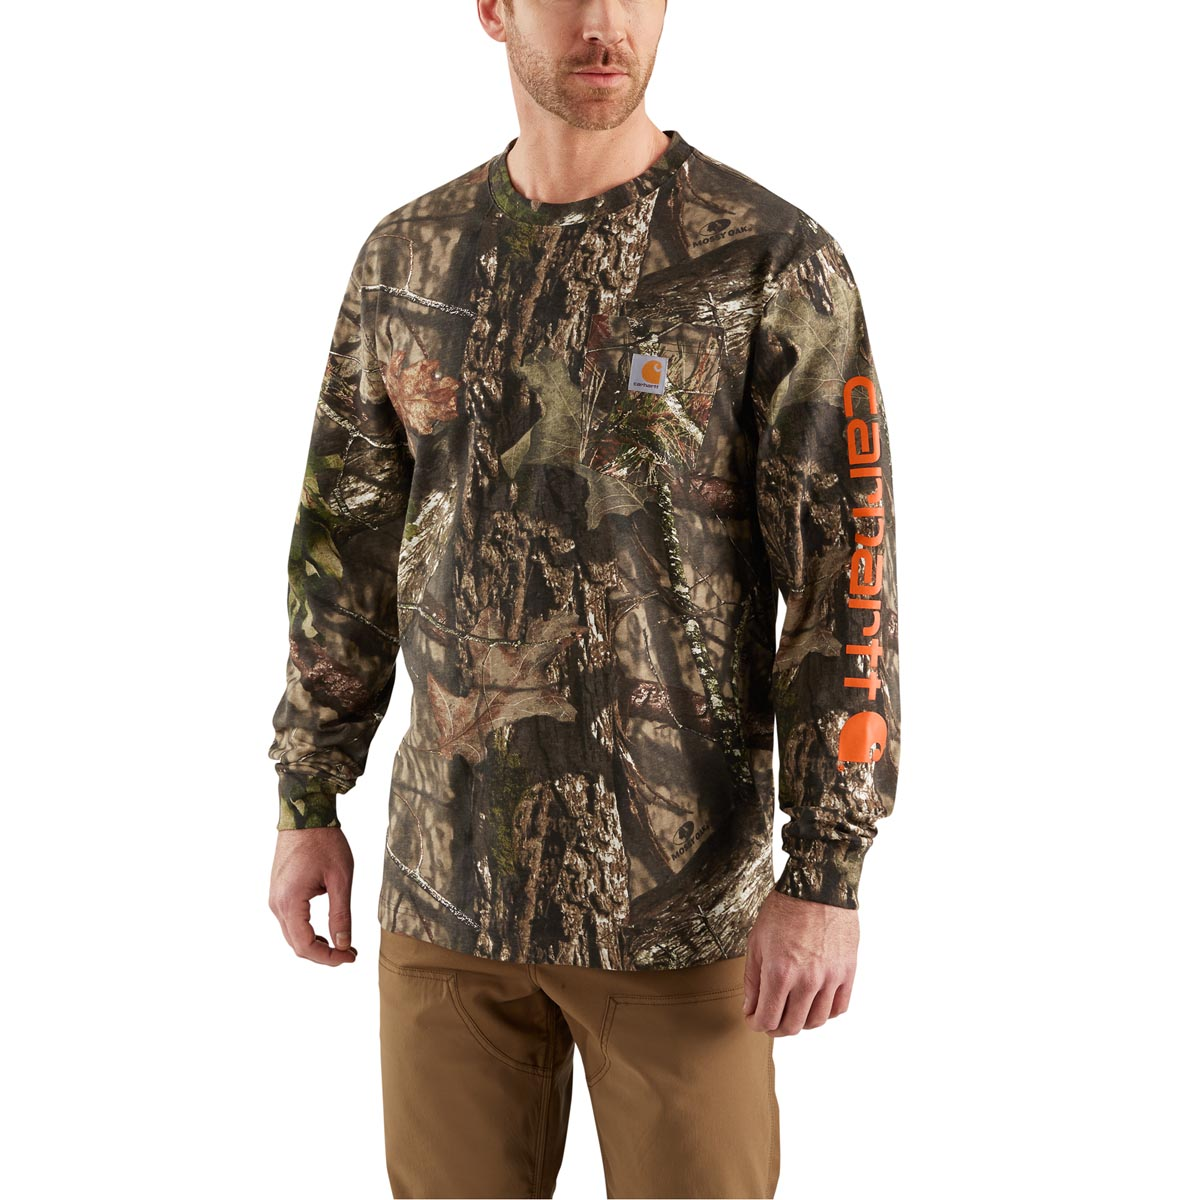 Carhartt Men's Workwear Graphic Camo Sleeve Long Sleeve T-Shirt